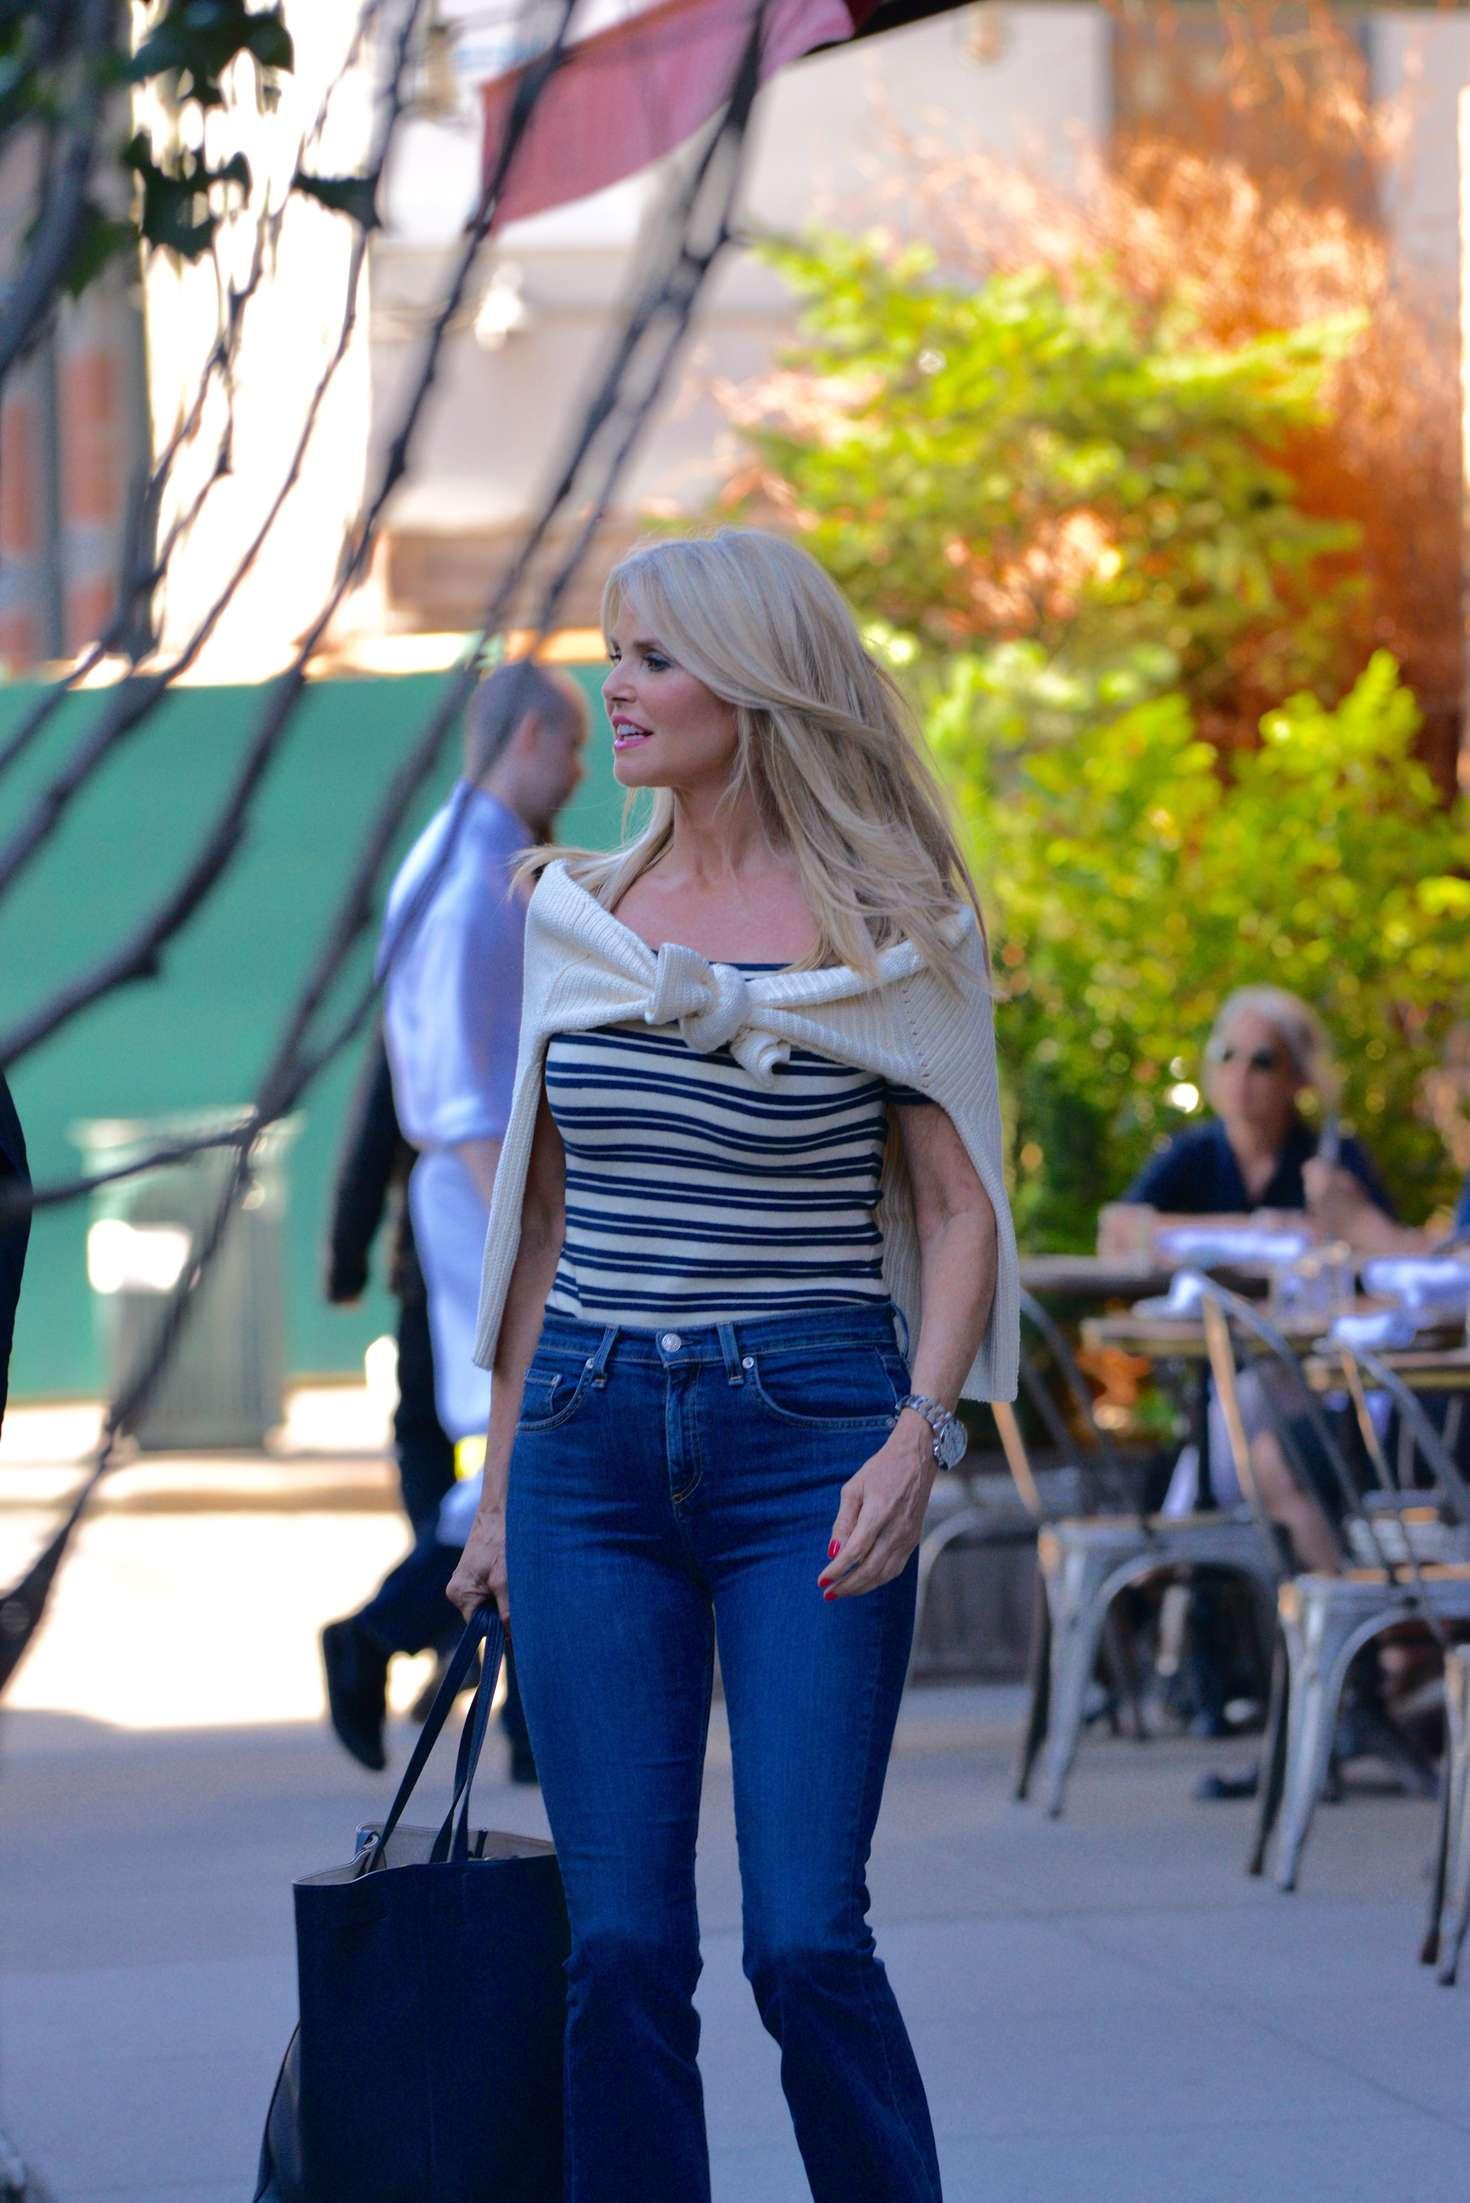 Christie Brinkley in Jeans -01 | GotCeleb